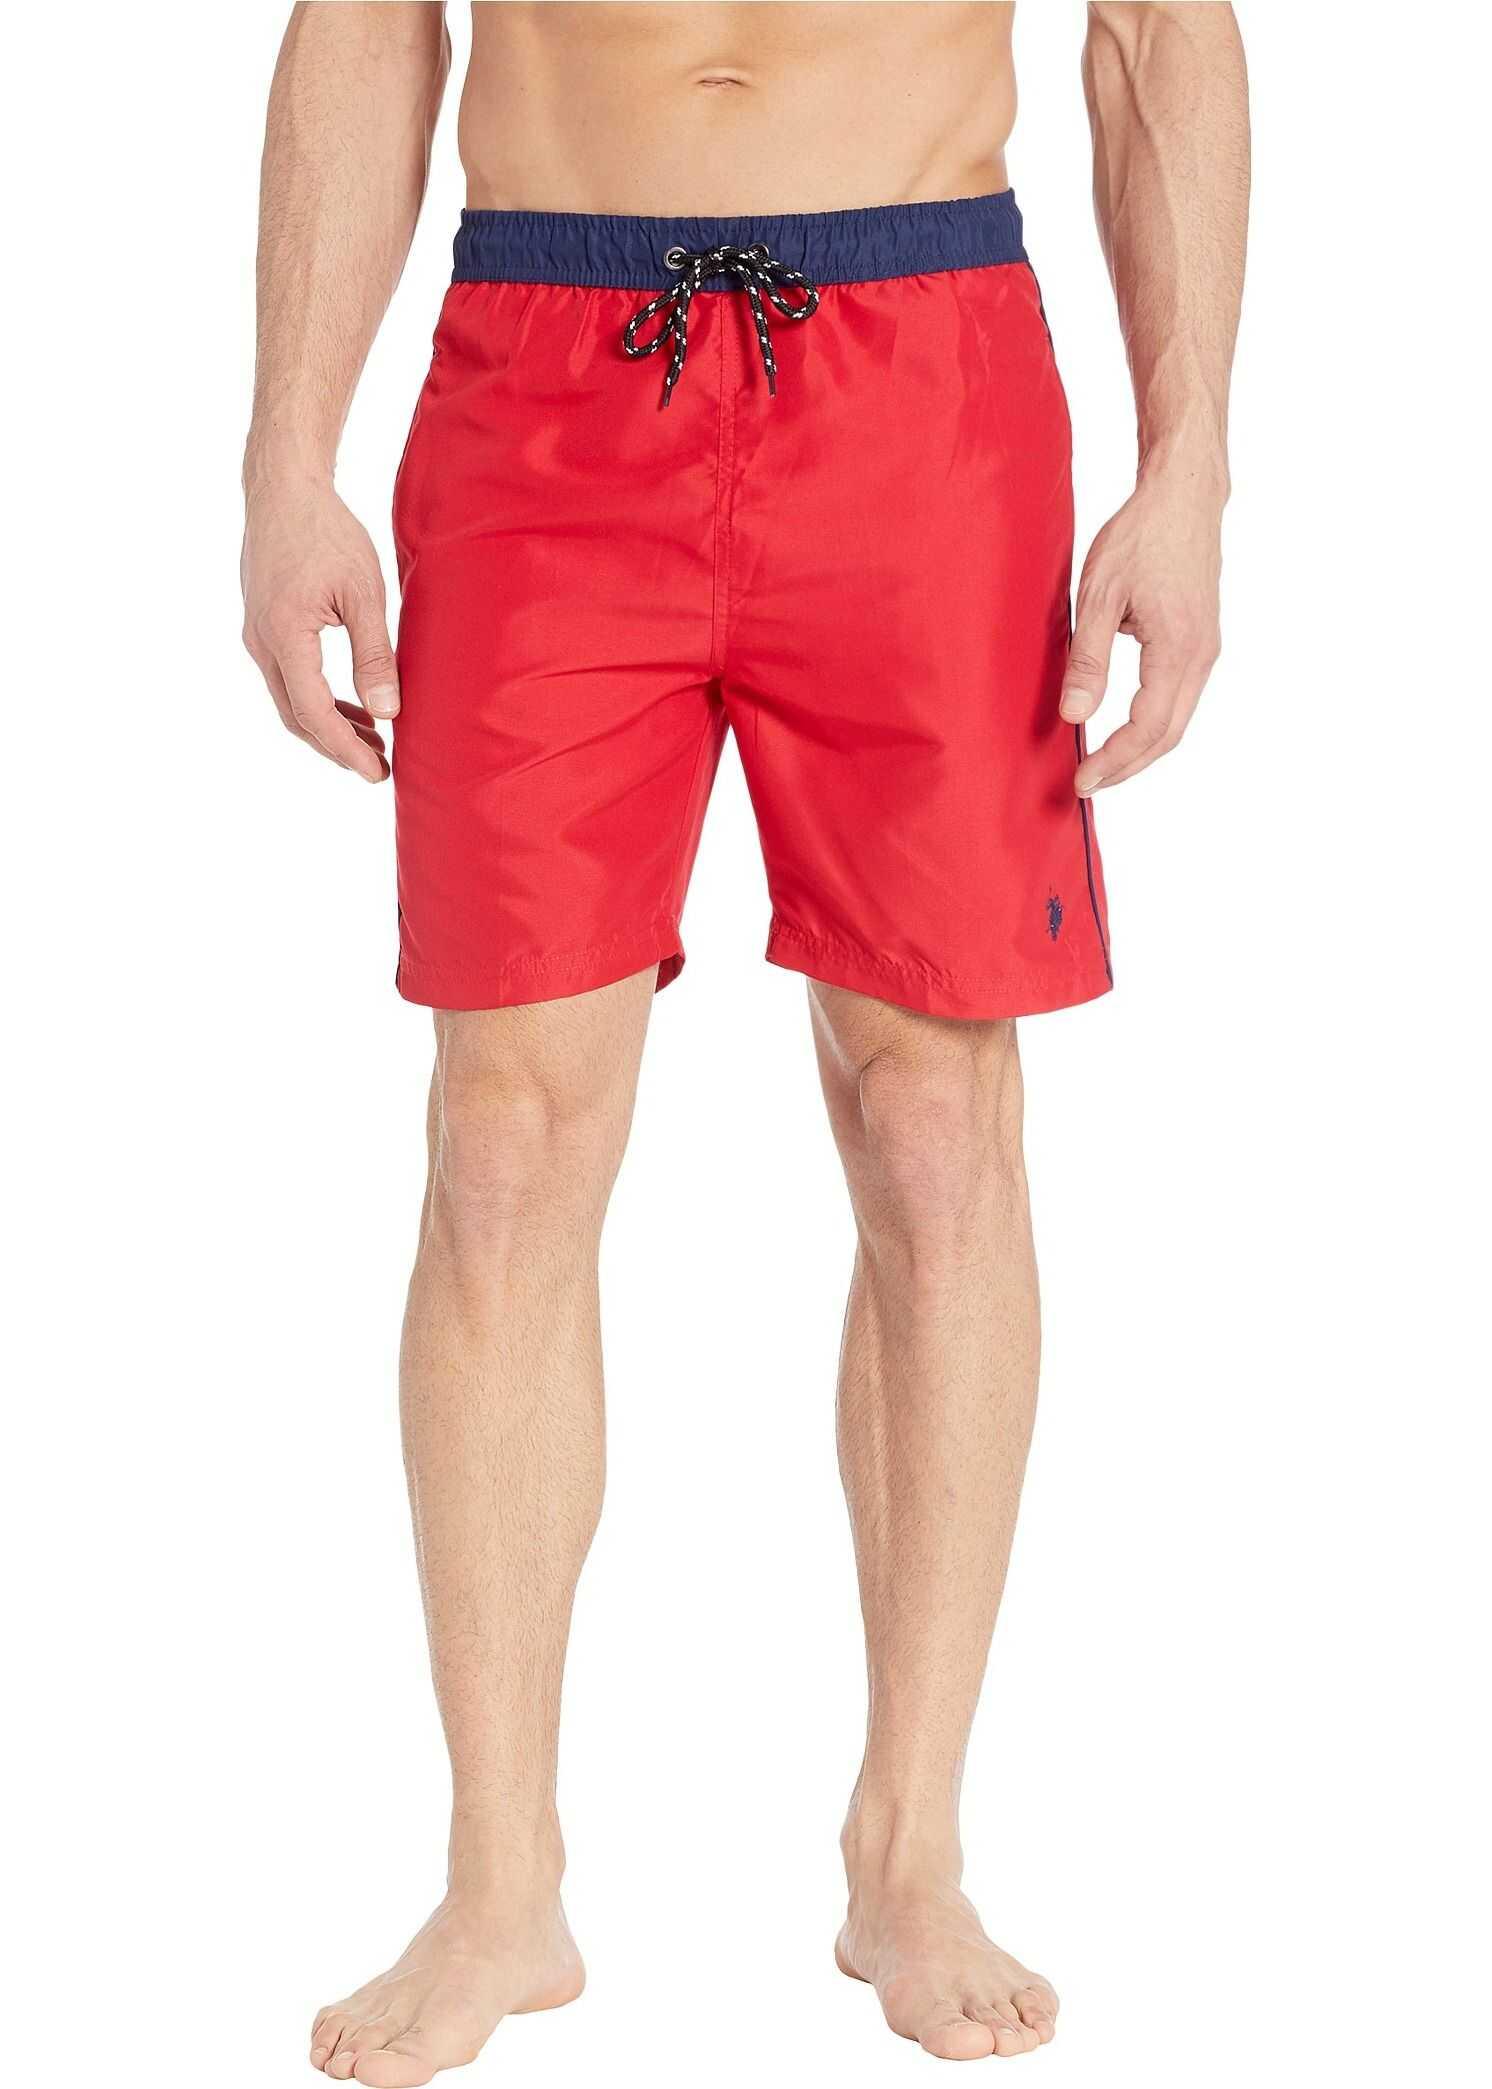 U.S. POLO ASSN. Contrast Waistband Swim Shorts Engine Red